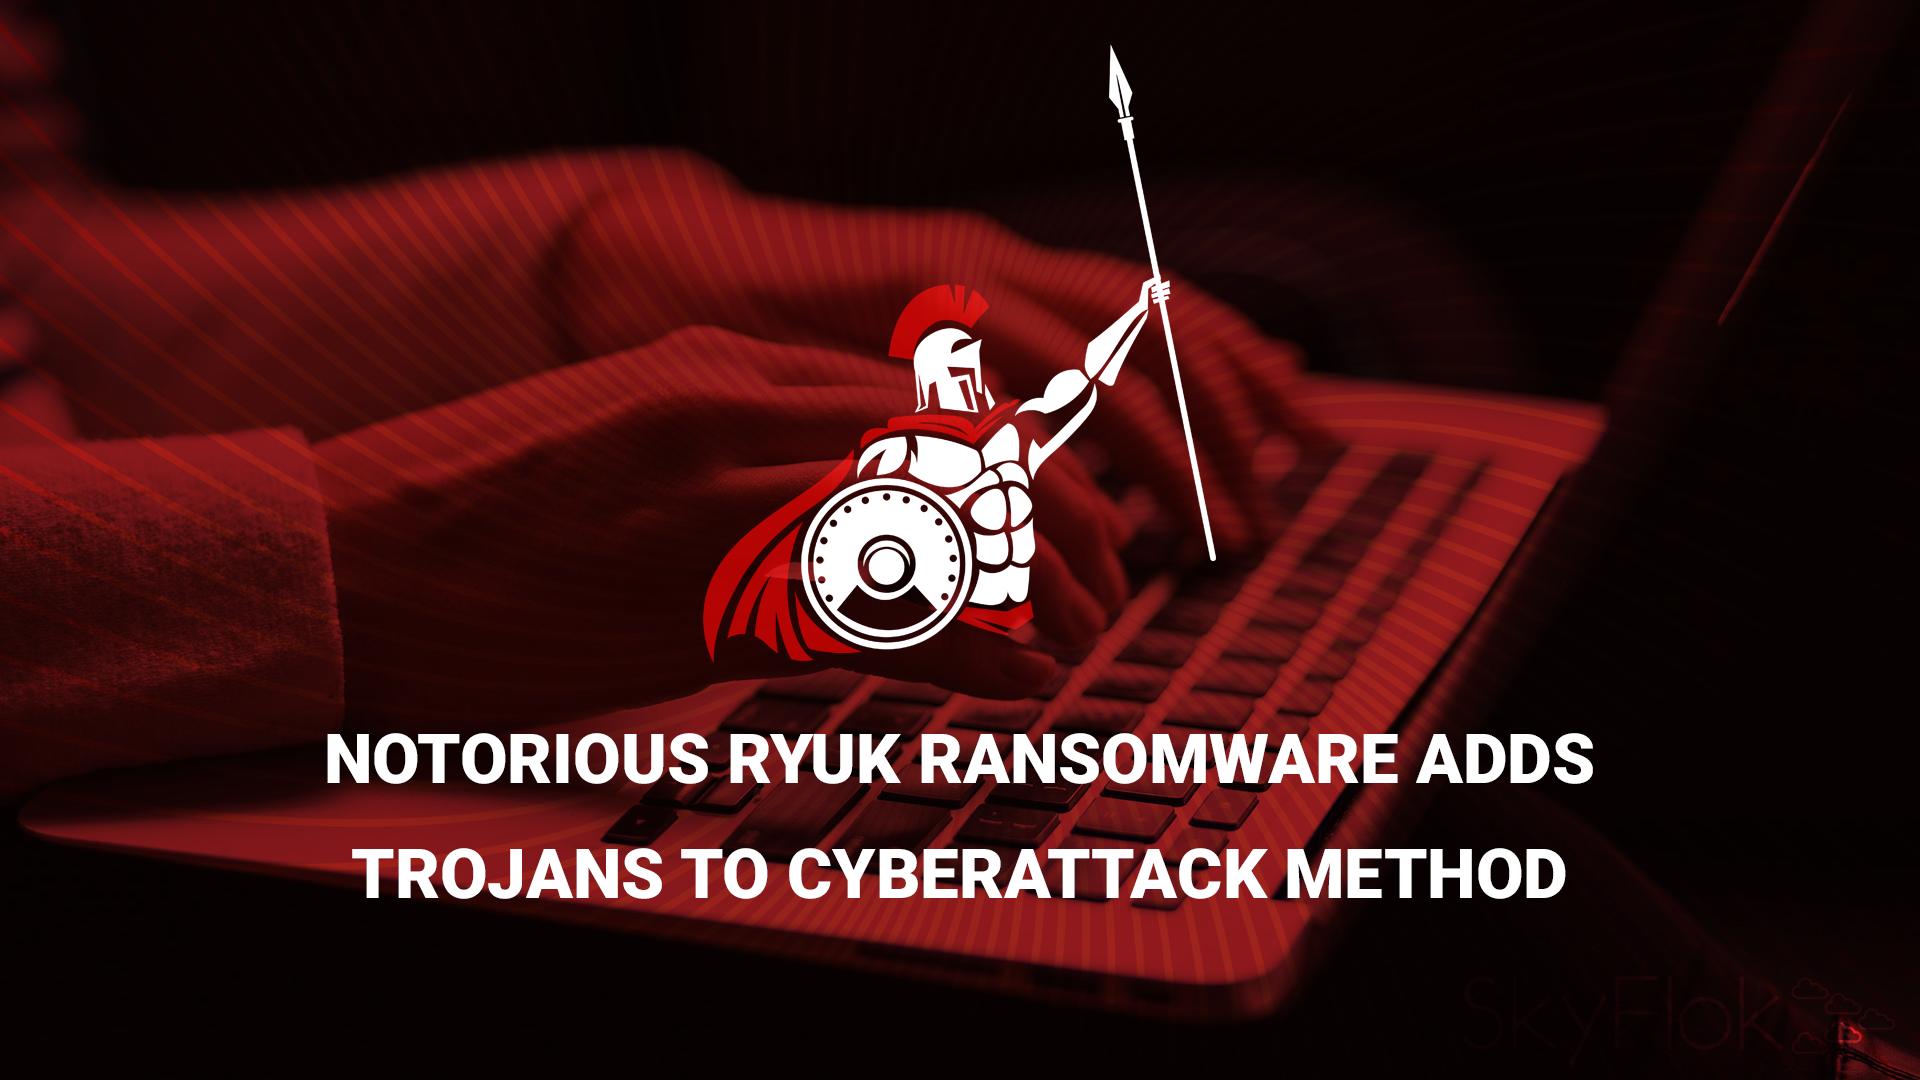 Notorious Ryuk Ransomware Adds Trojans to Cyberattack Method